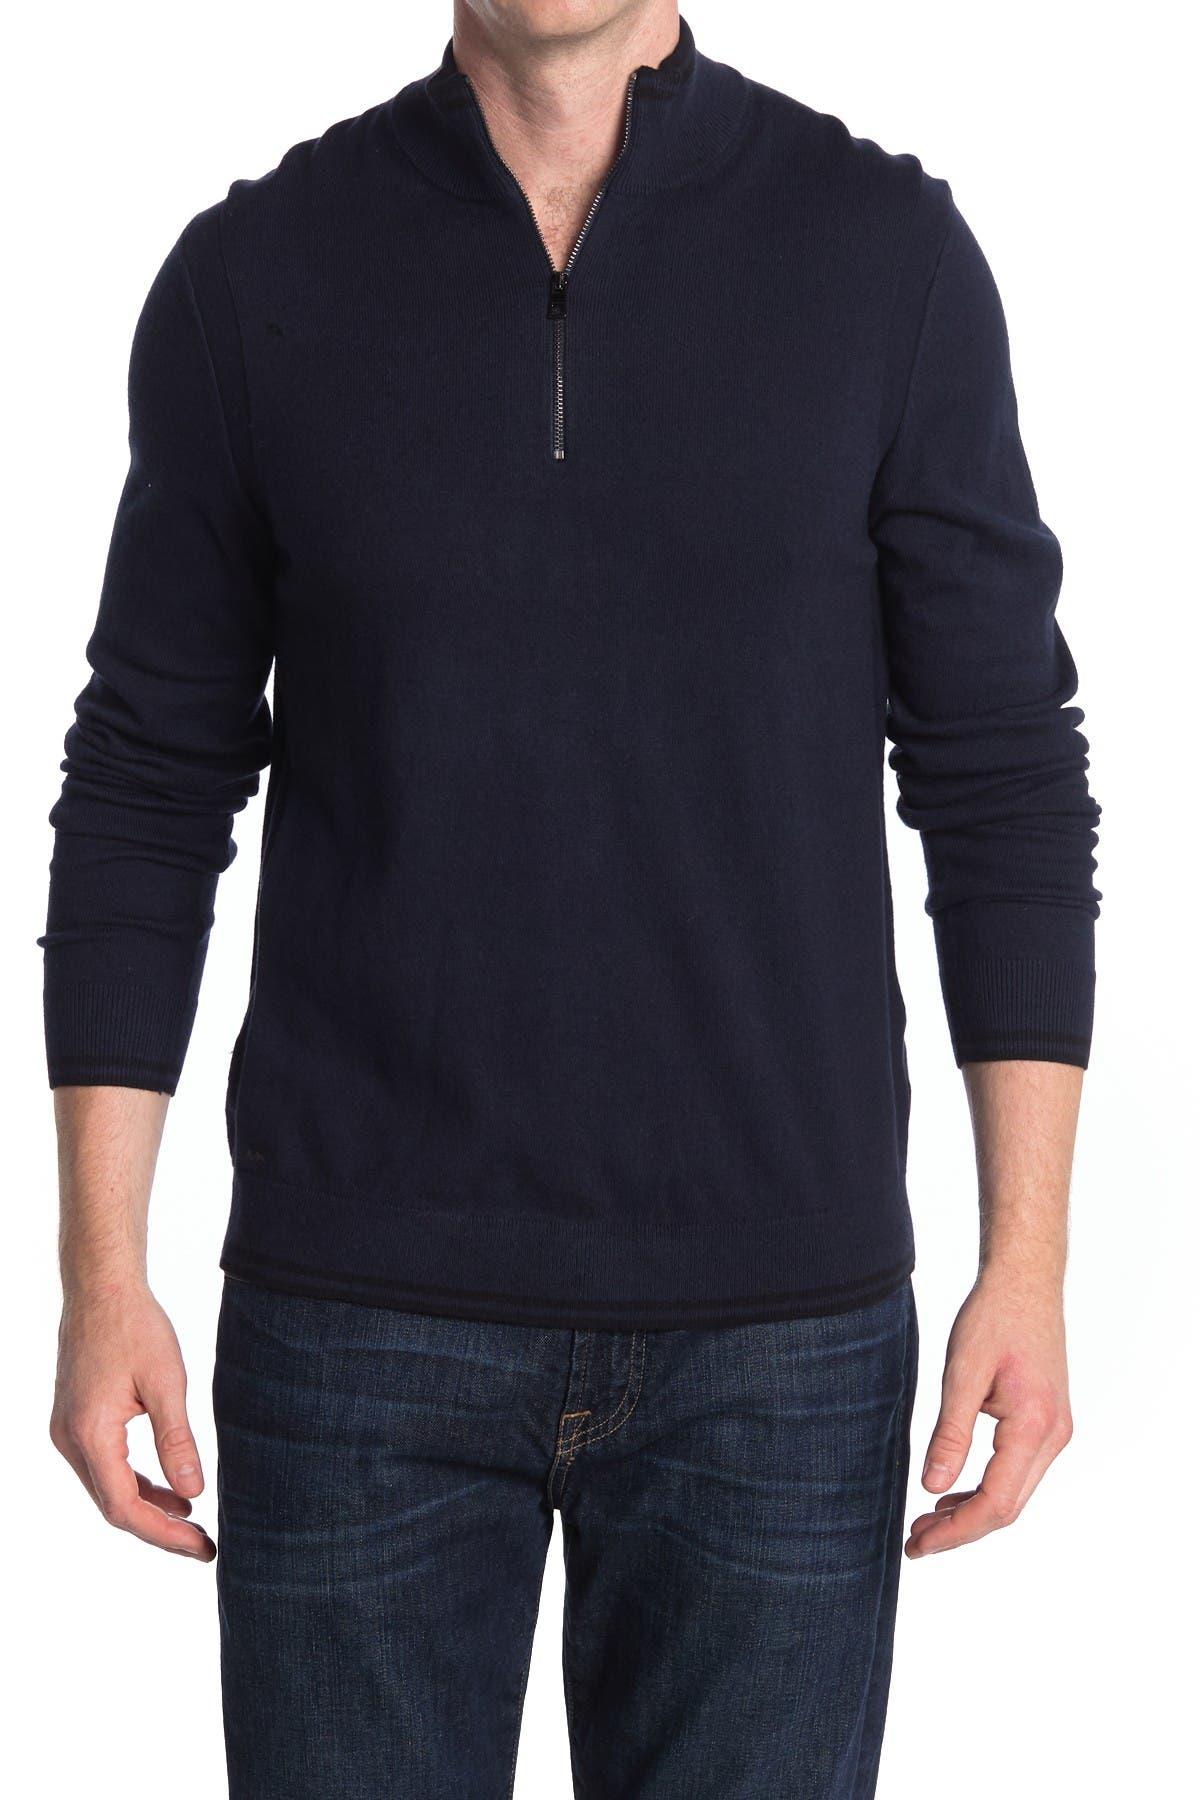 Image of Michael Kors Quarter Zip Sweater